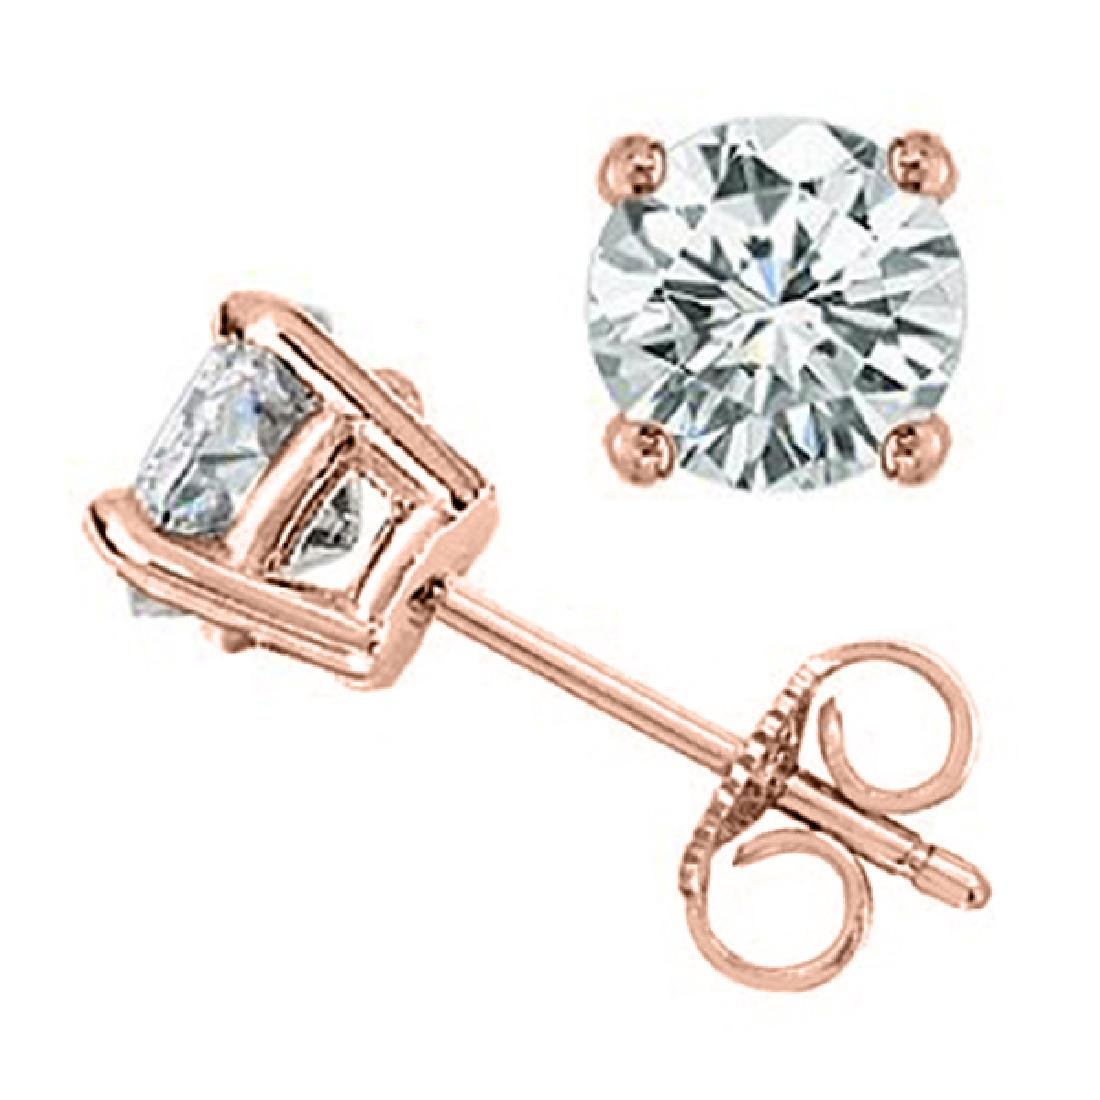 1.0 CTW Certified VS/SI Diamond Solitaire Stud Earrings